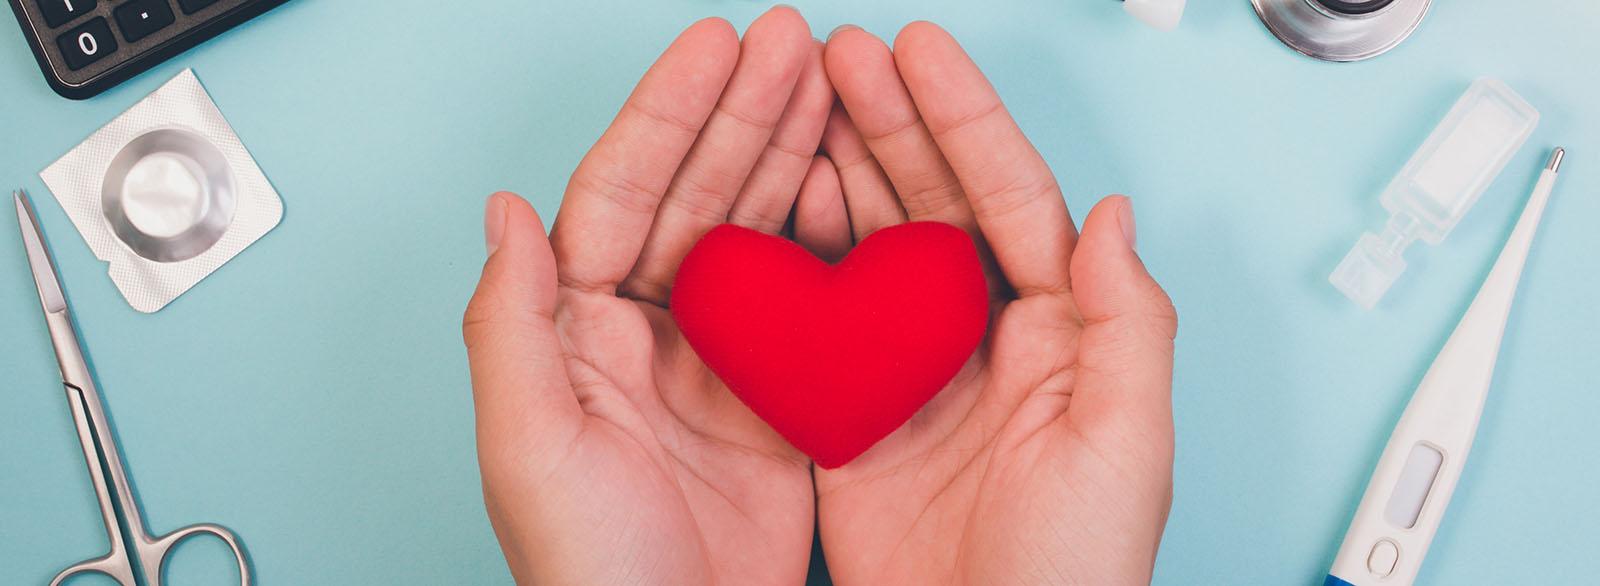 Hands holding plush heart